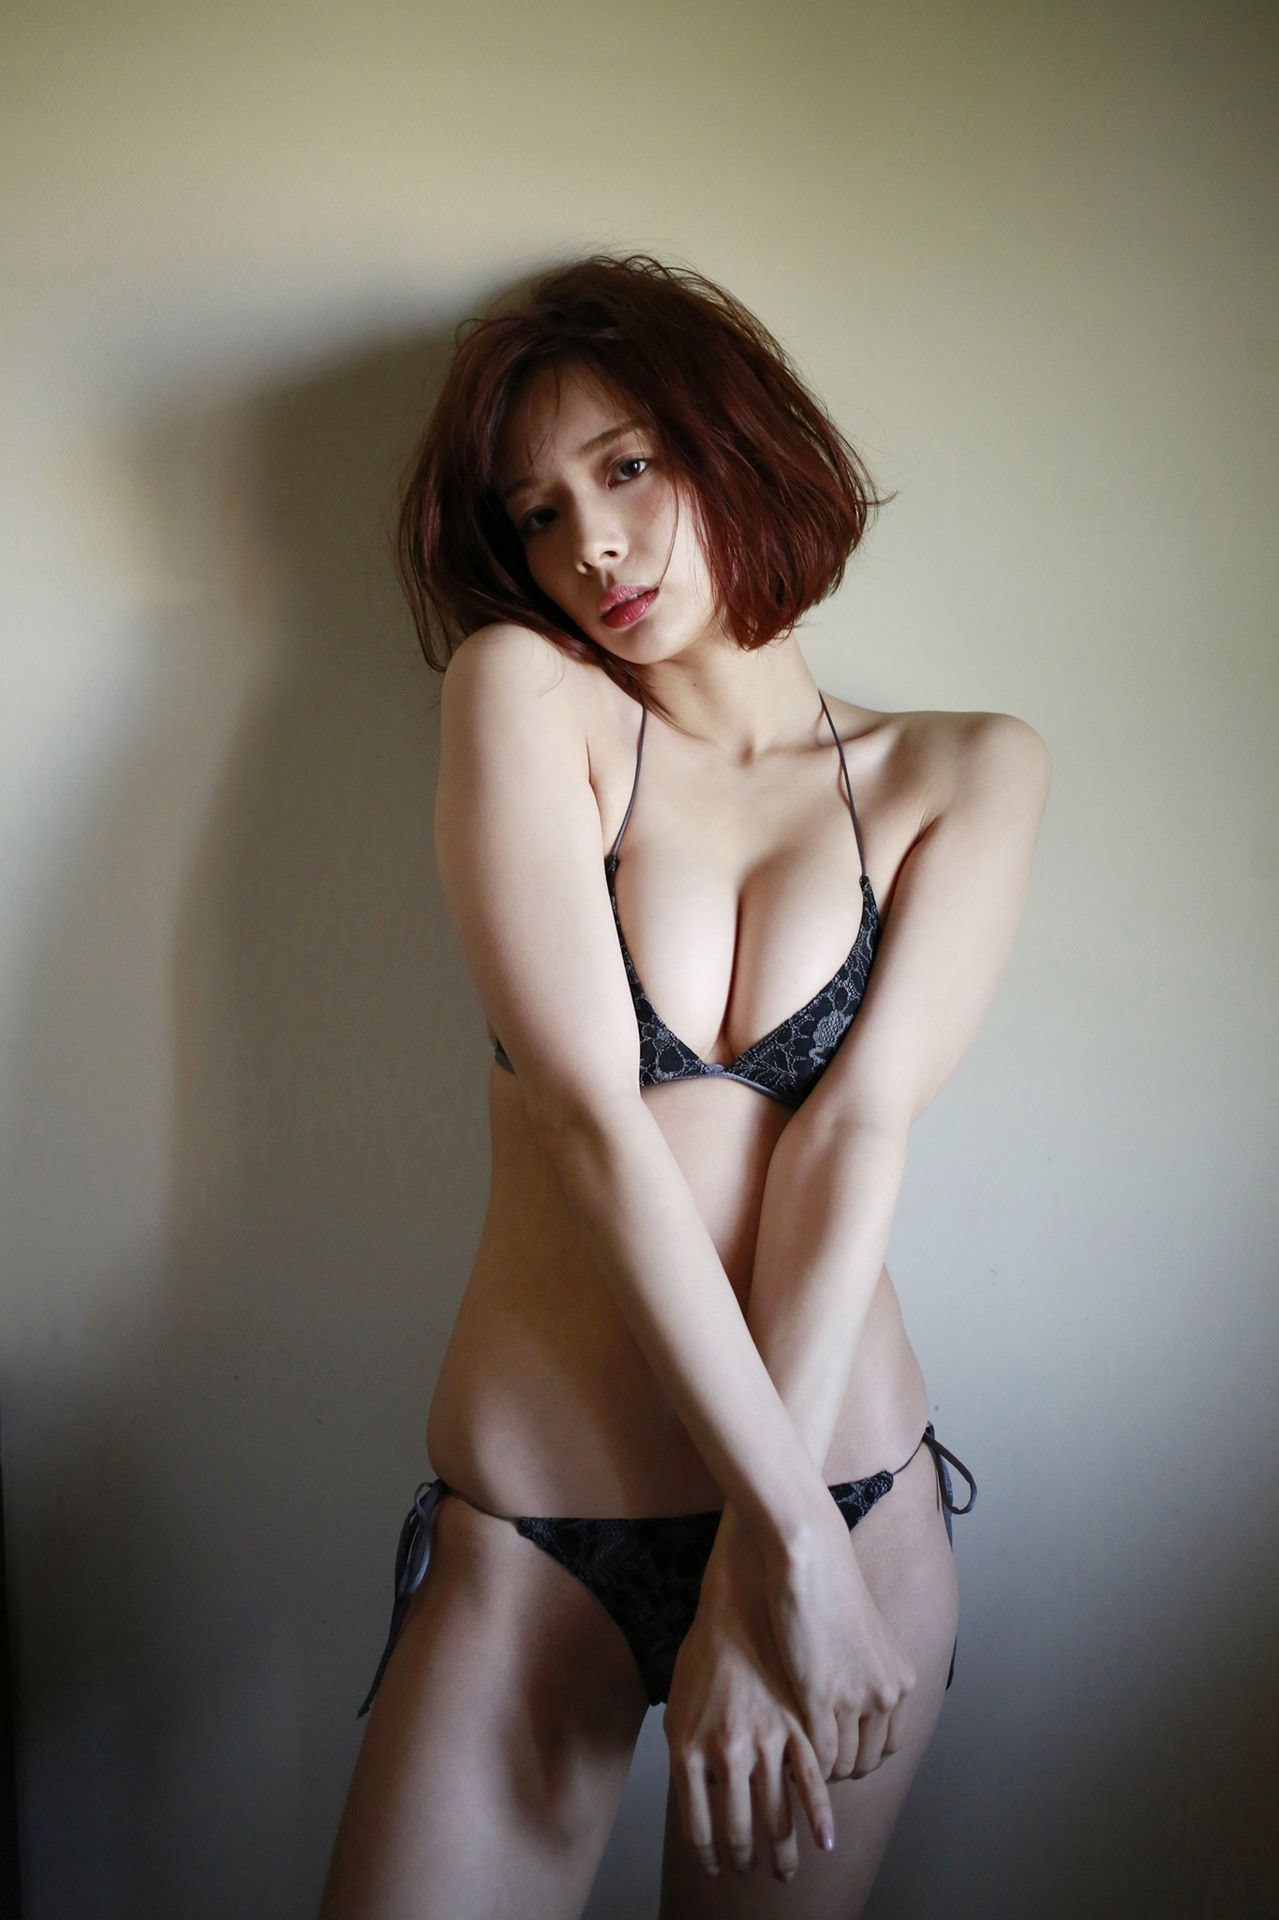 23 years old Shaka Okada, who is also a professional mahjong player071